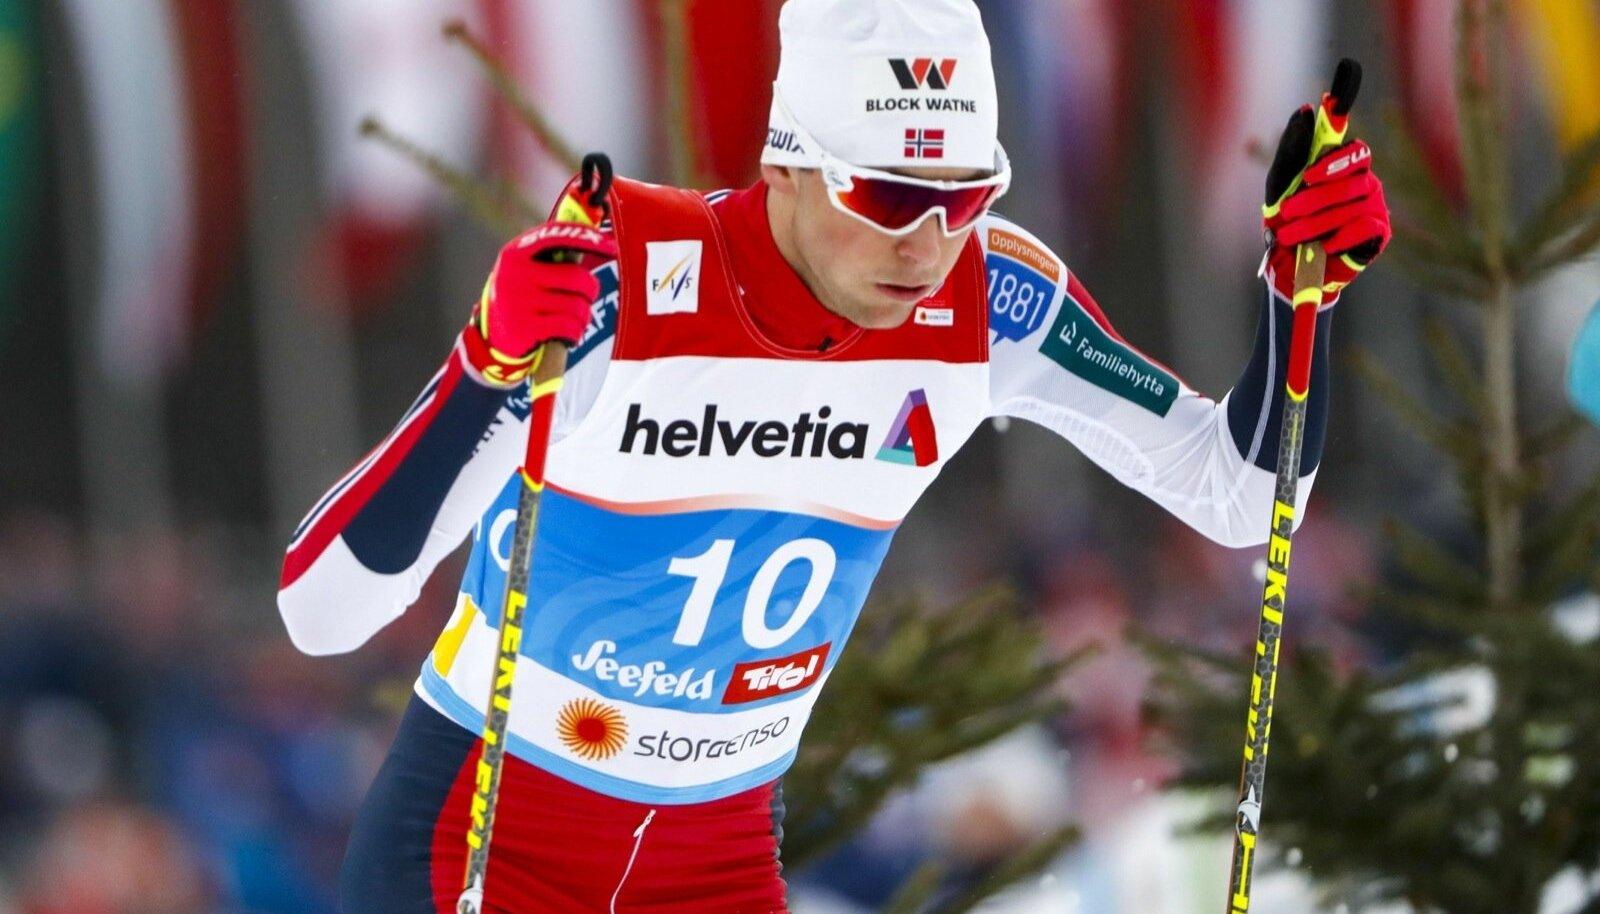 FIS Nordic World Ski Championships 2019 day 3